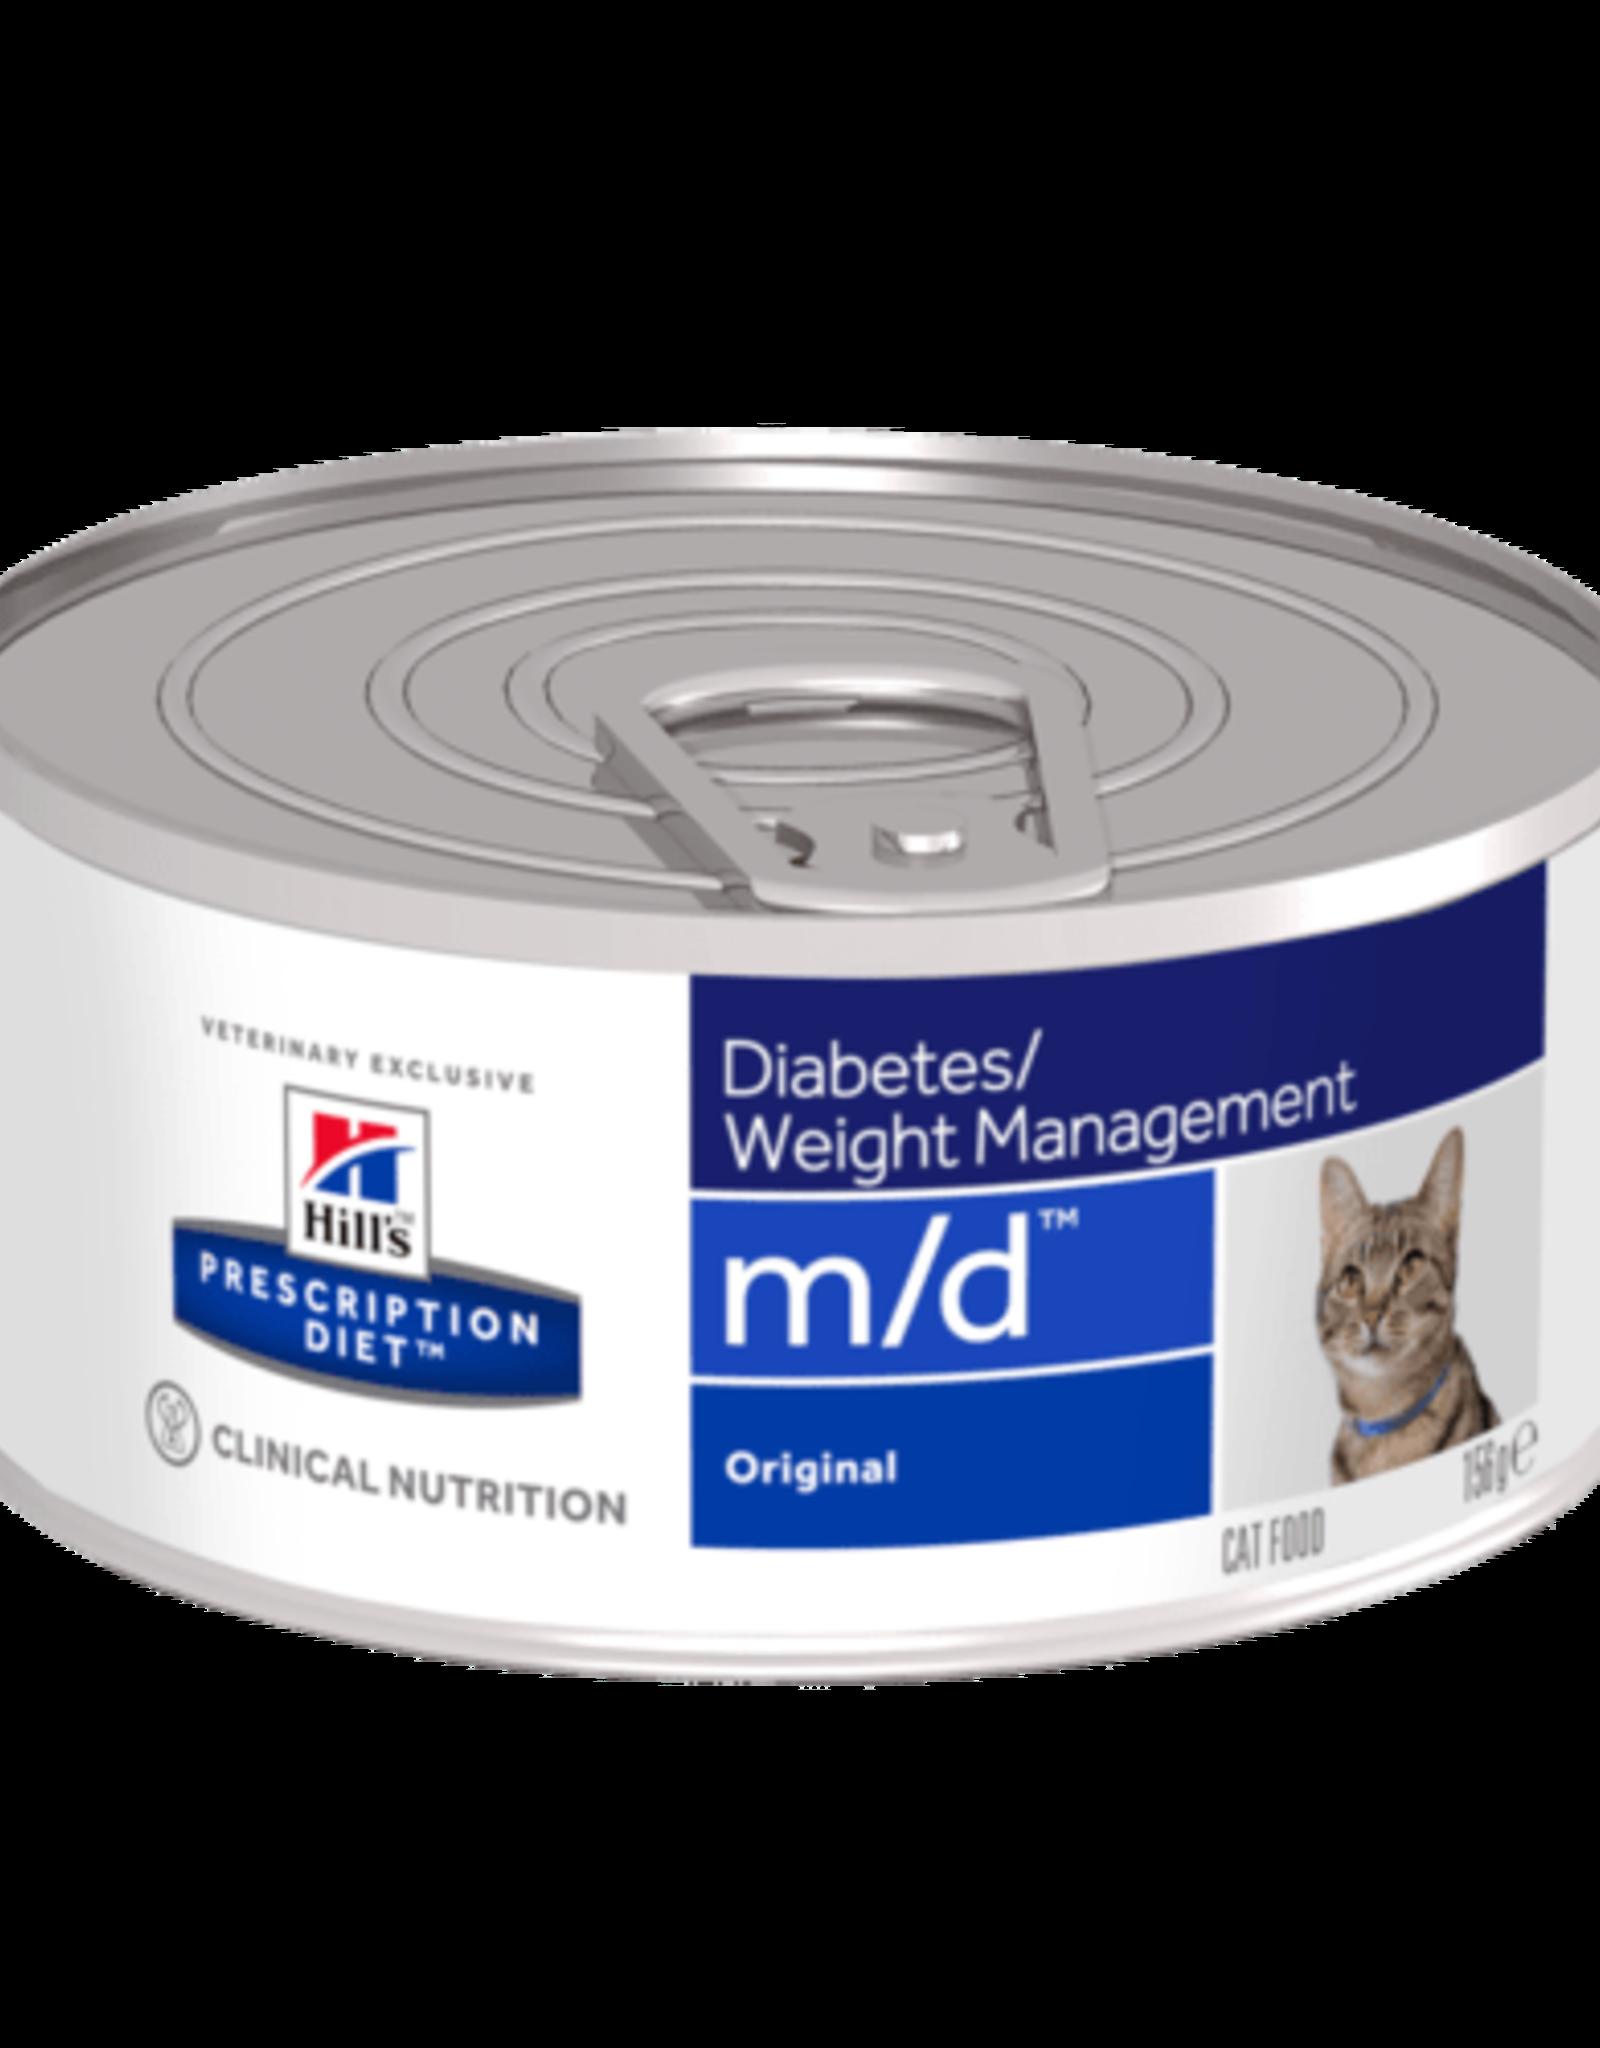 Hill's Hill's Prescription Diet M/d Cat 24x156gr